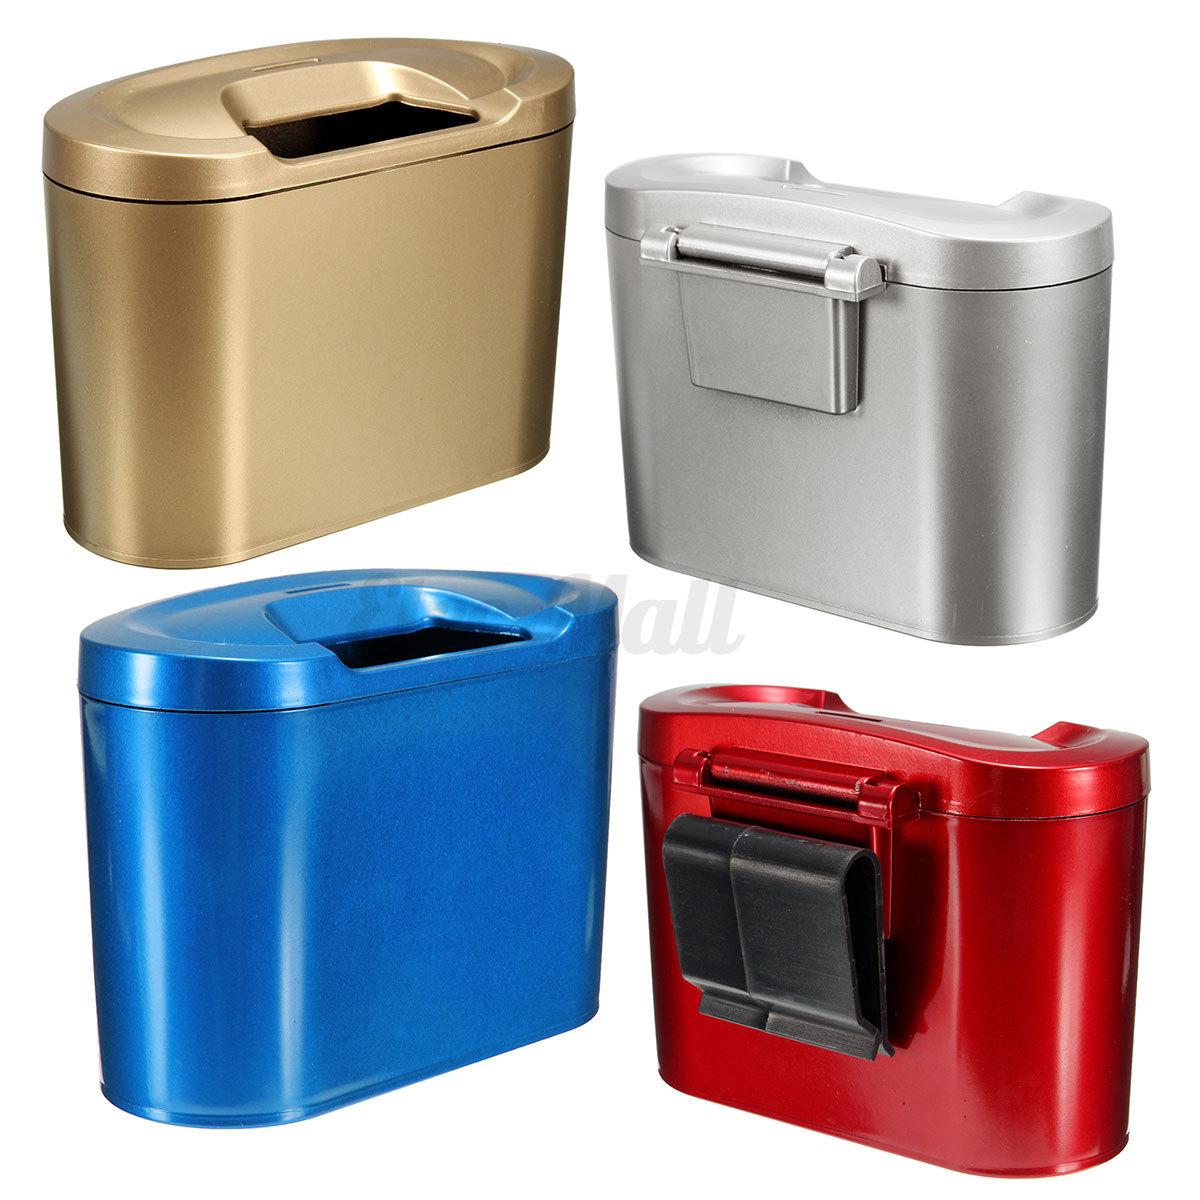 car trash can bin garbage storage box multifunction vehicle container dustbin ebay. Black Bedroom Furniture Sets. Home Design Ideas